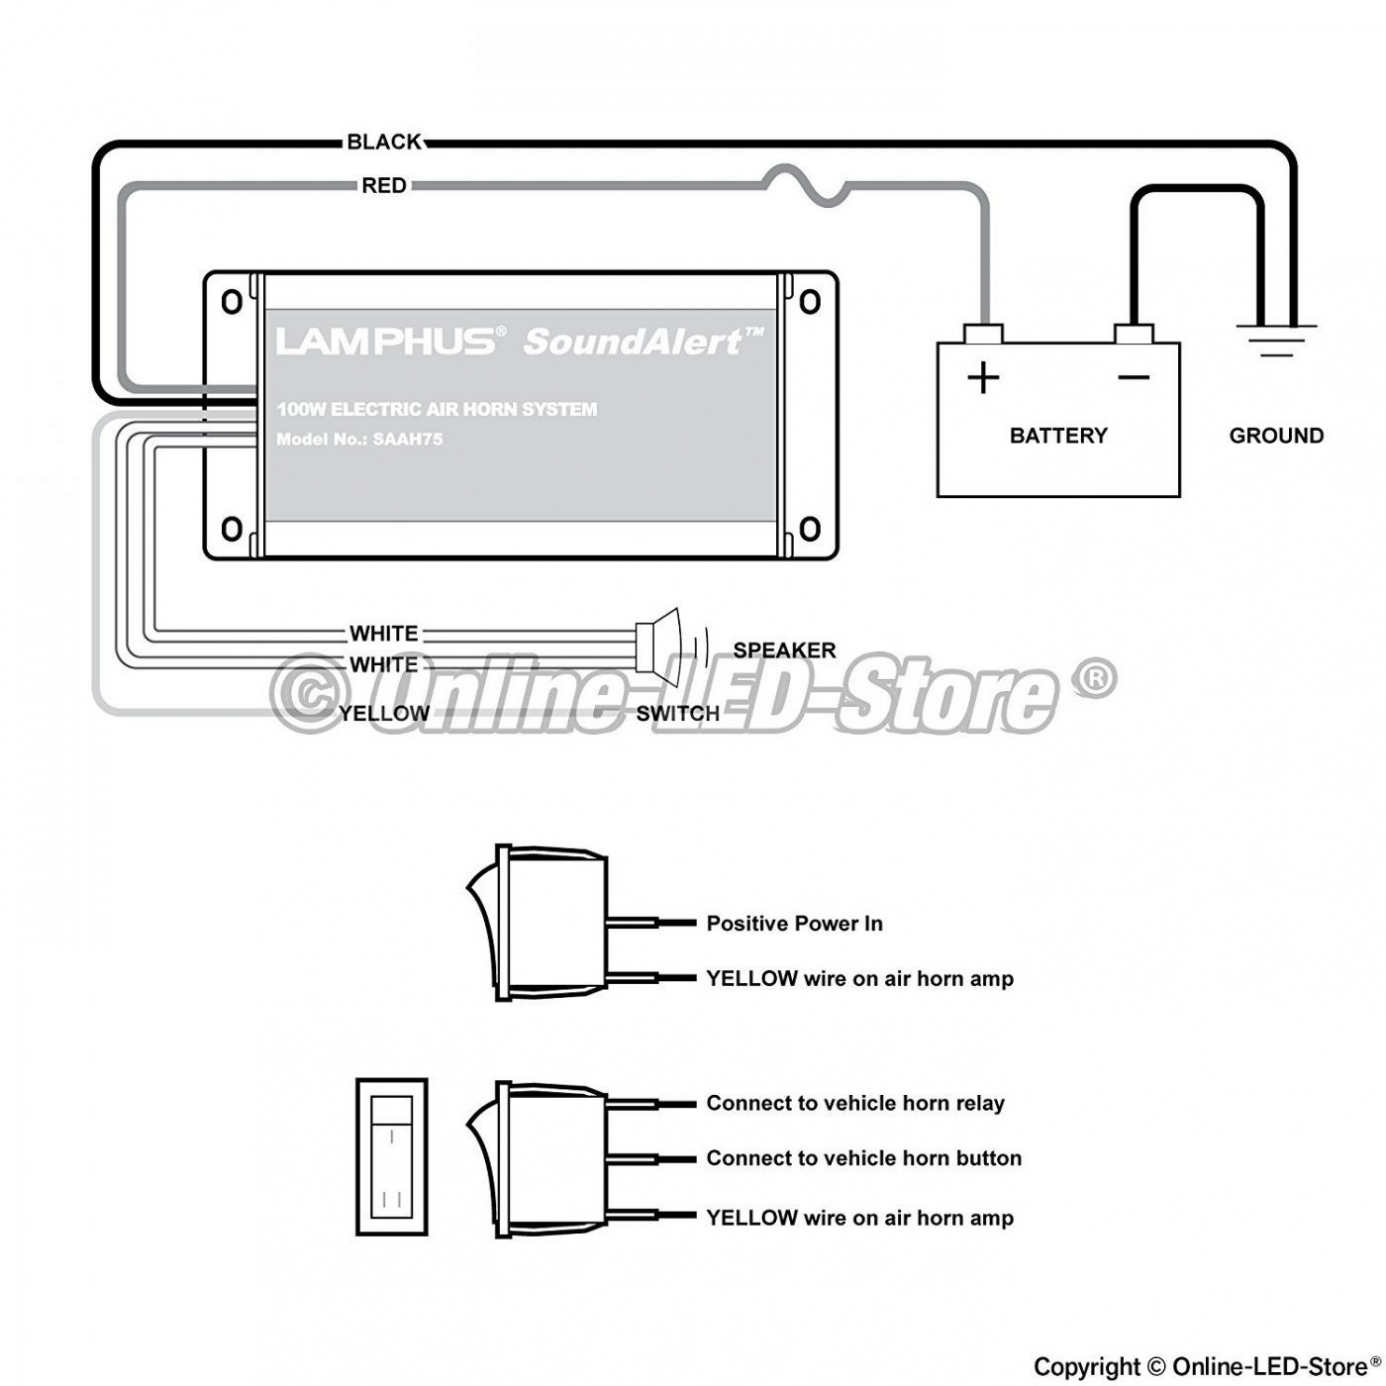 Car Horn Wire Diagram | Wiring Library - Car Horn Wiring Diagram